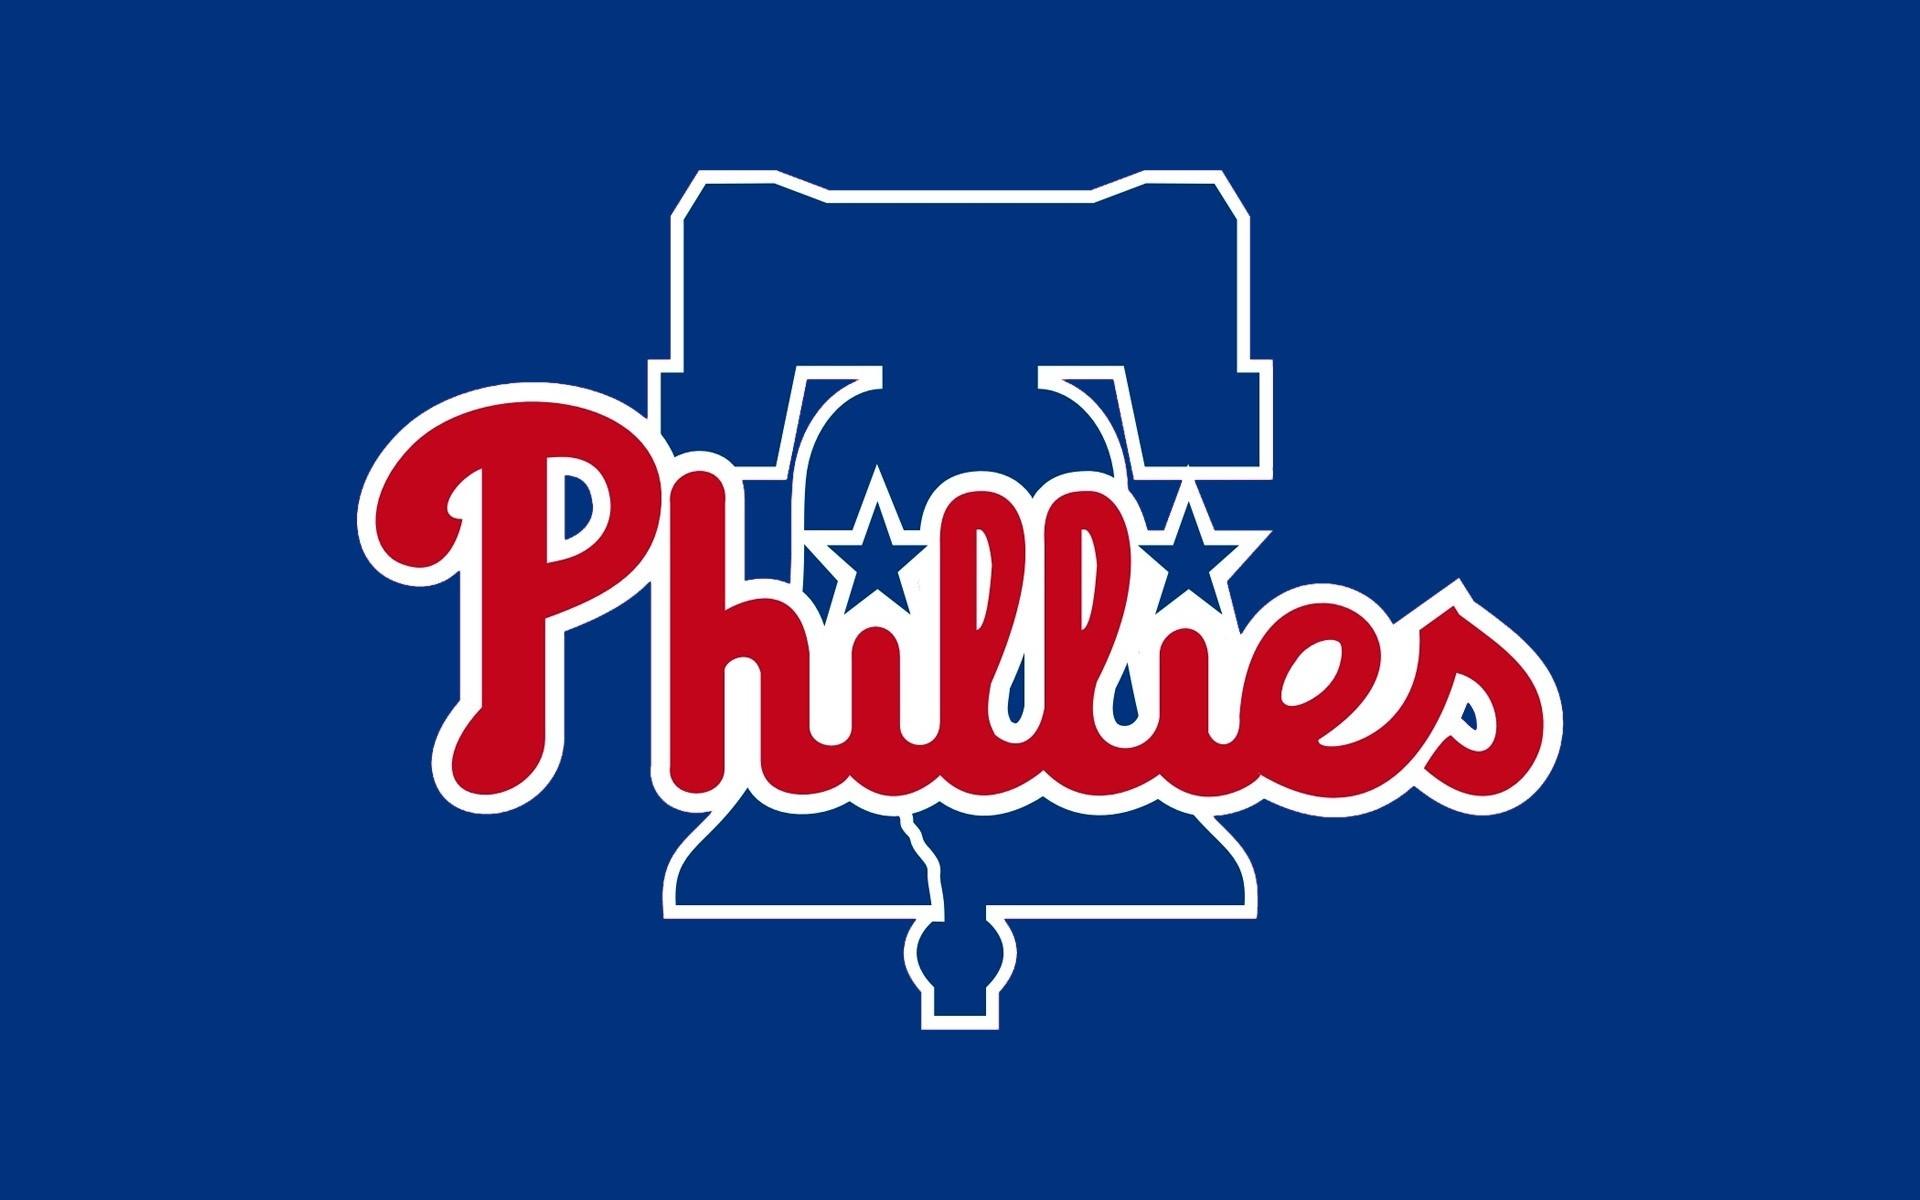 Philadelphia Phillies Browser Themes and Desktop/iPhone Wallpaper for the  Biggest Phanatics – Brand Thunder